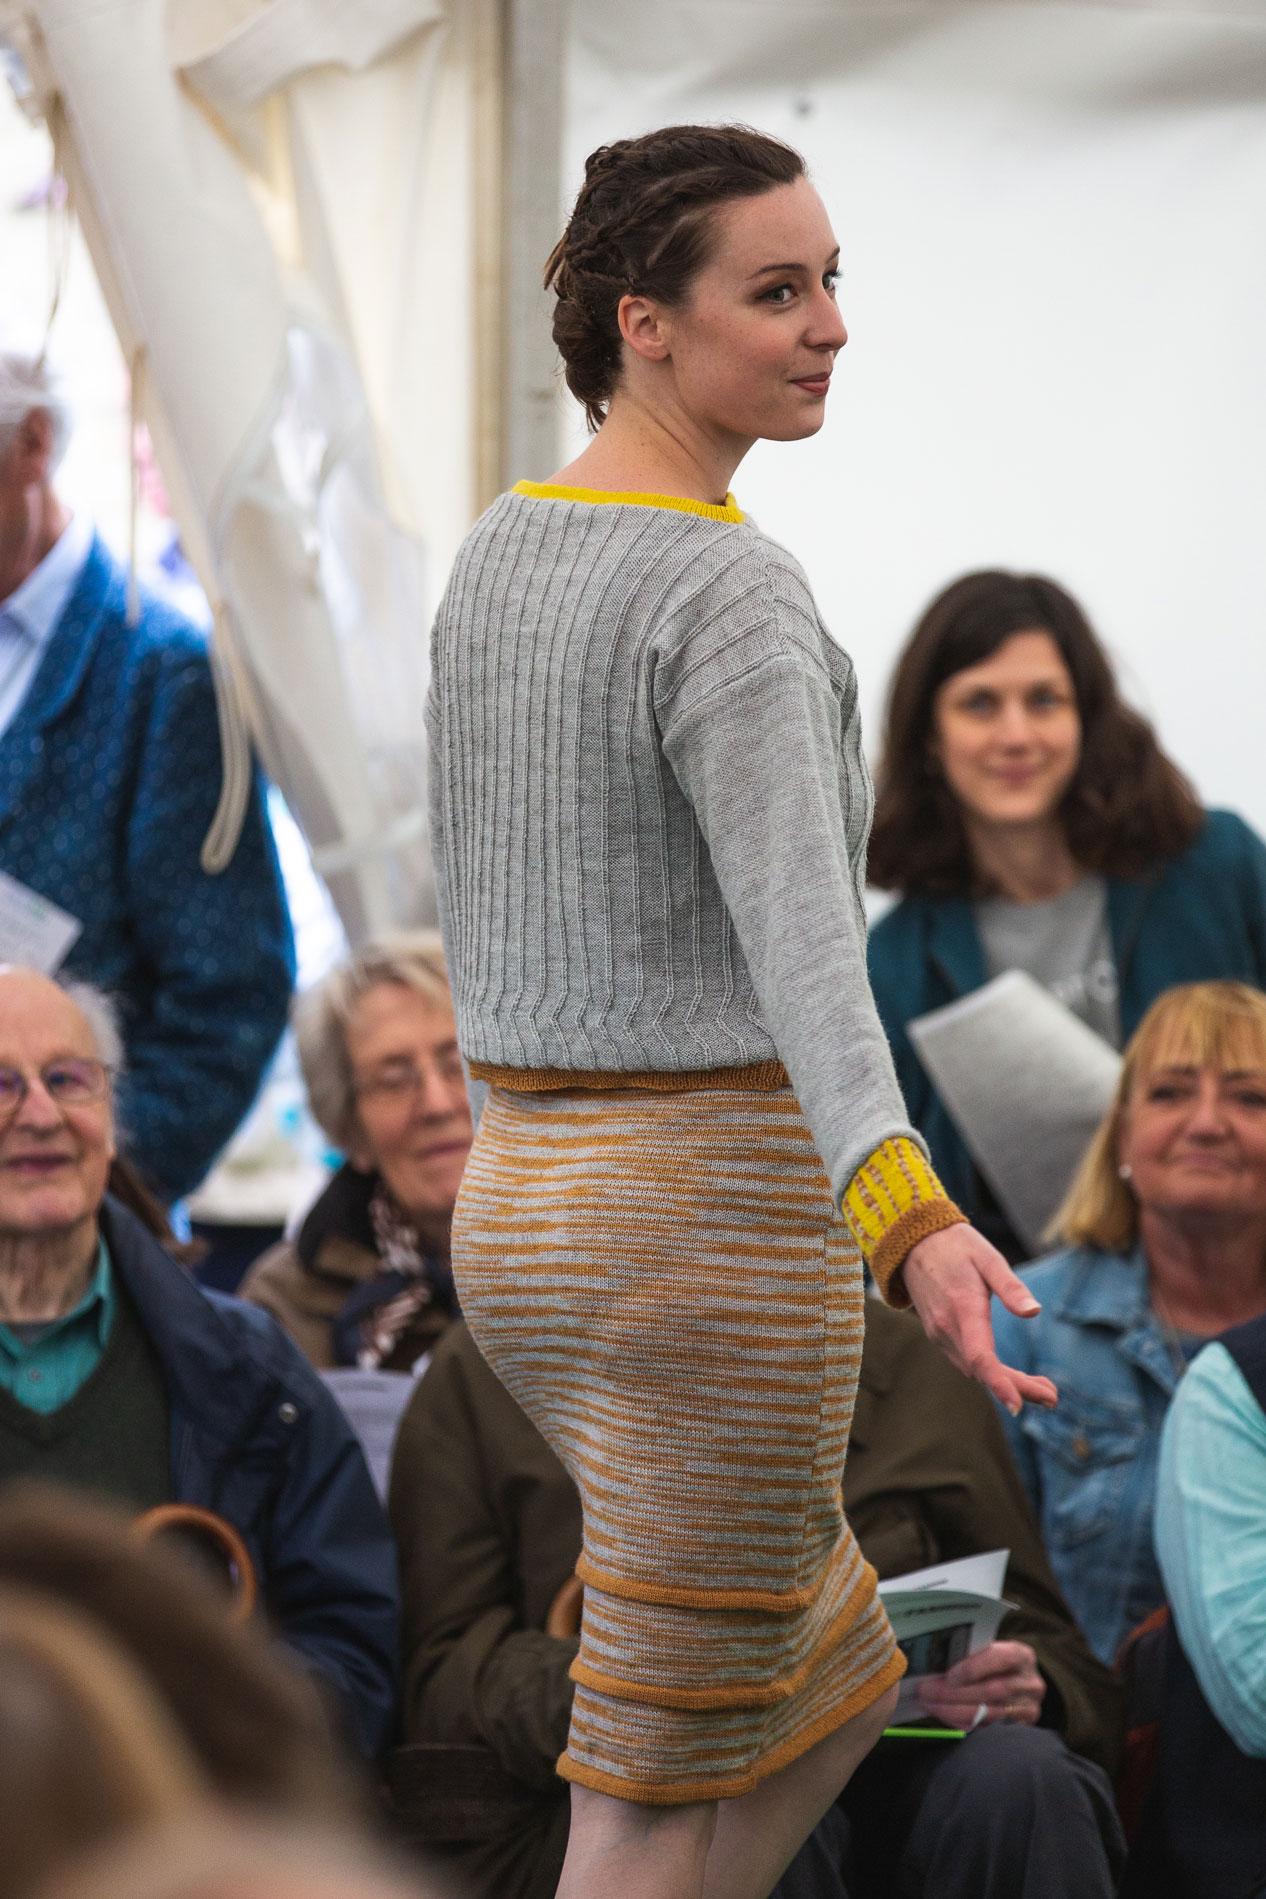 ria-burns-knitwear-fresh-air-fashion-2019-jumper-skirt-knitted-naturally-dyed-2.jpg